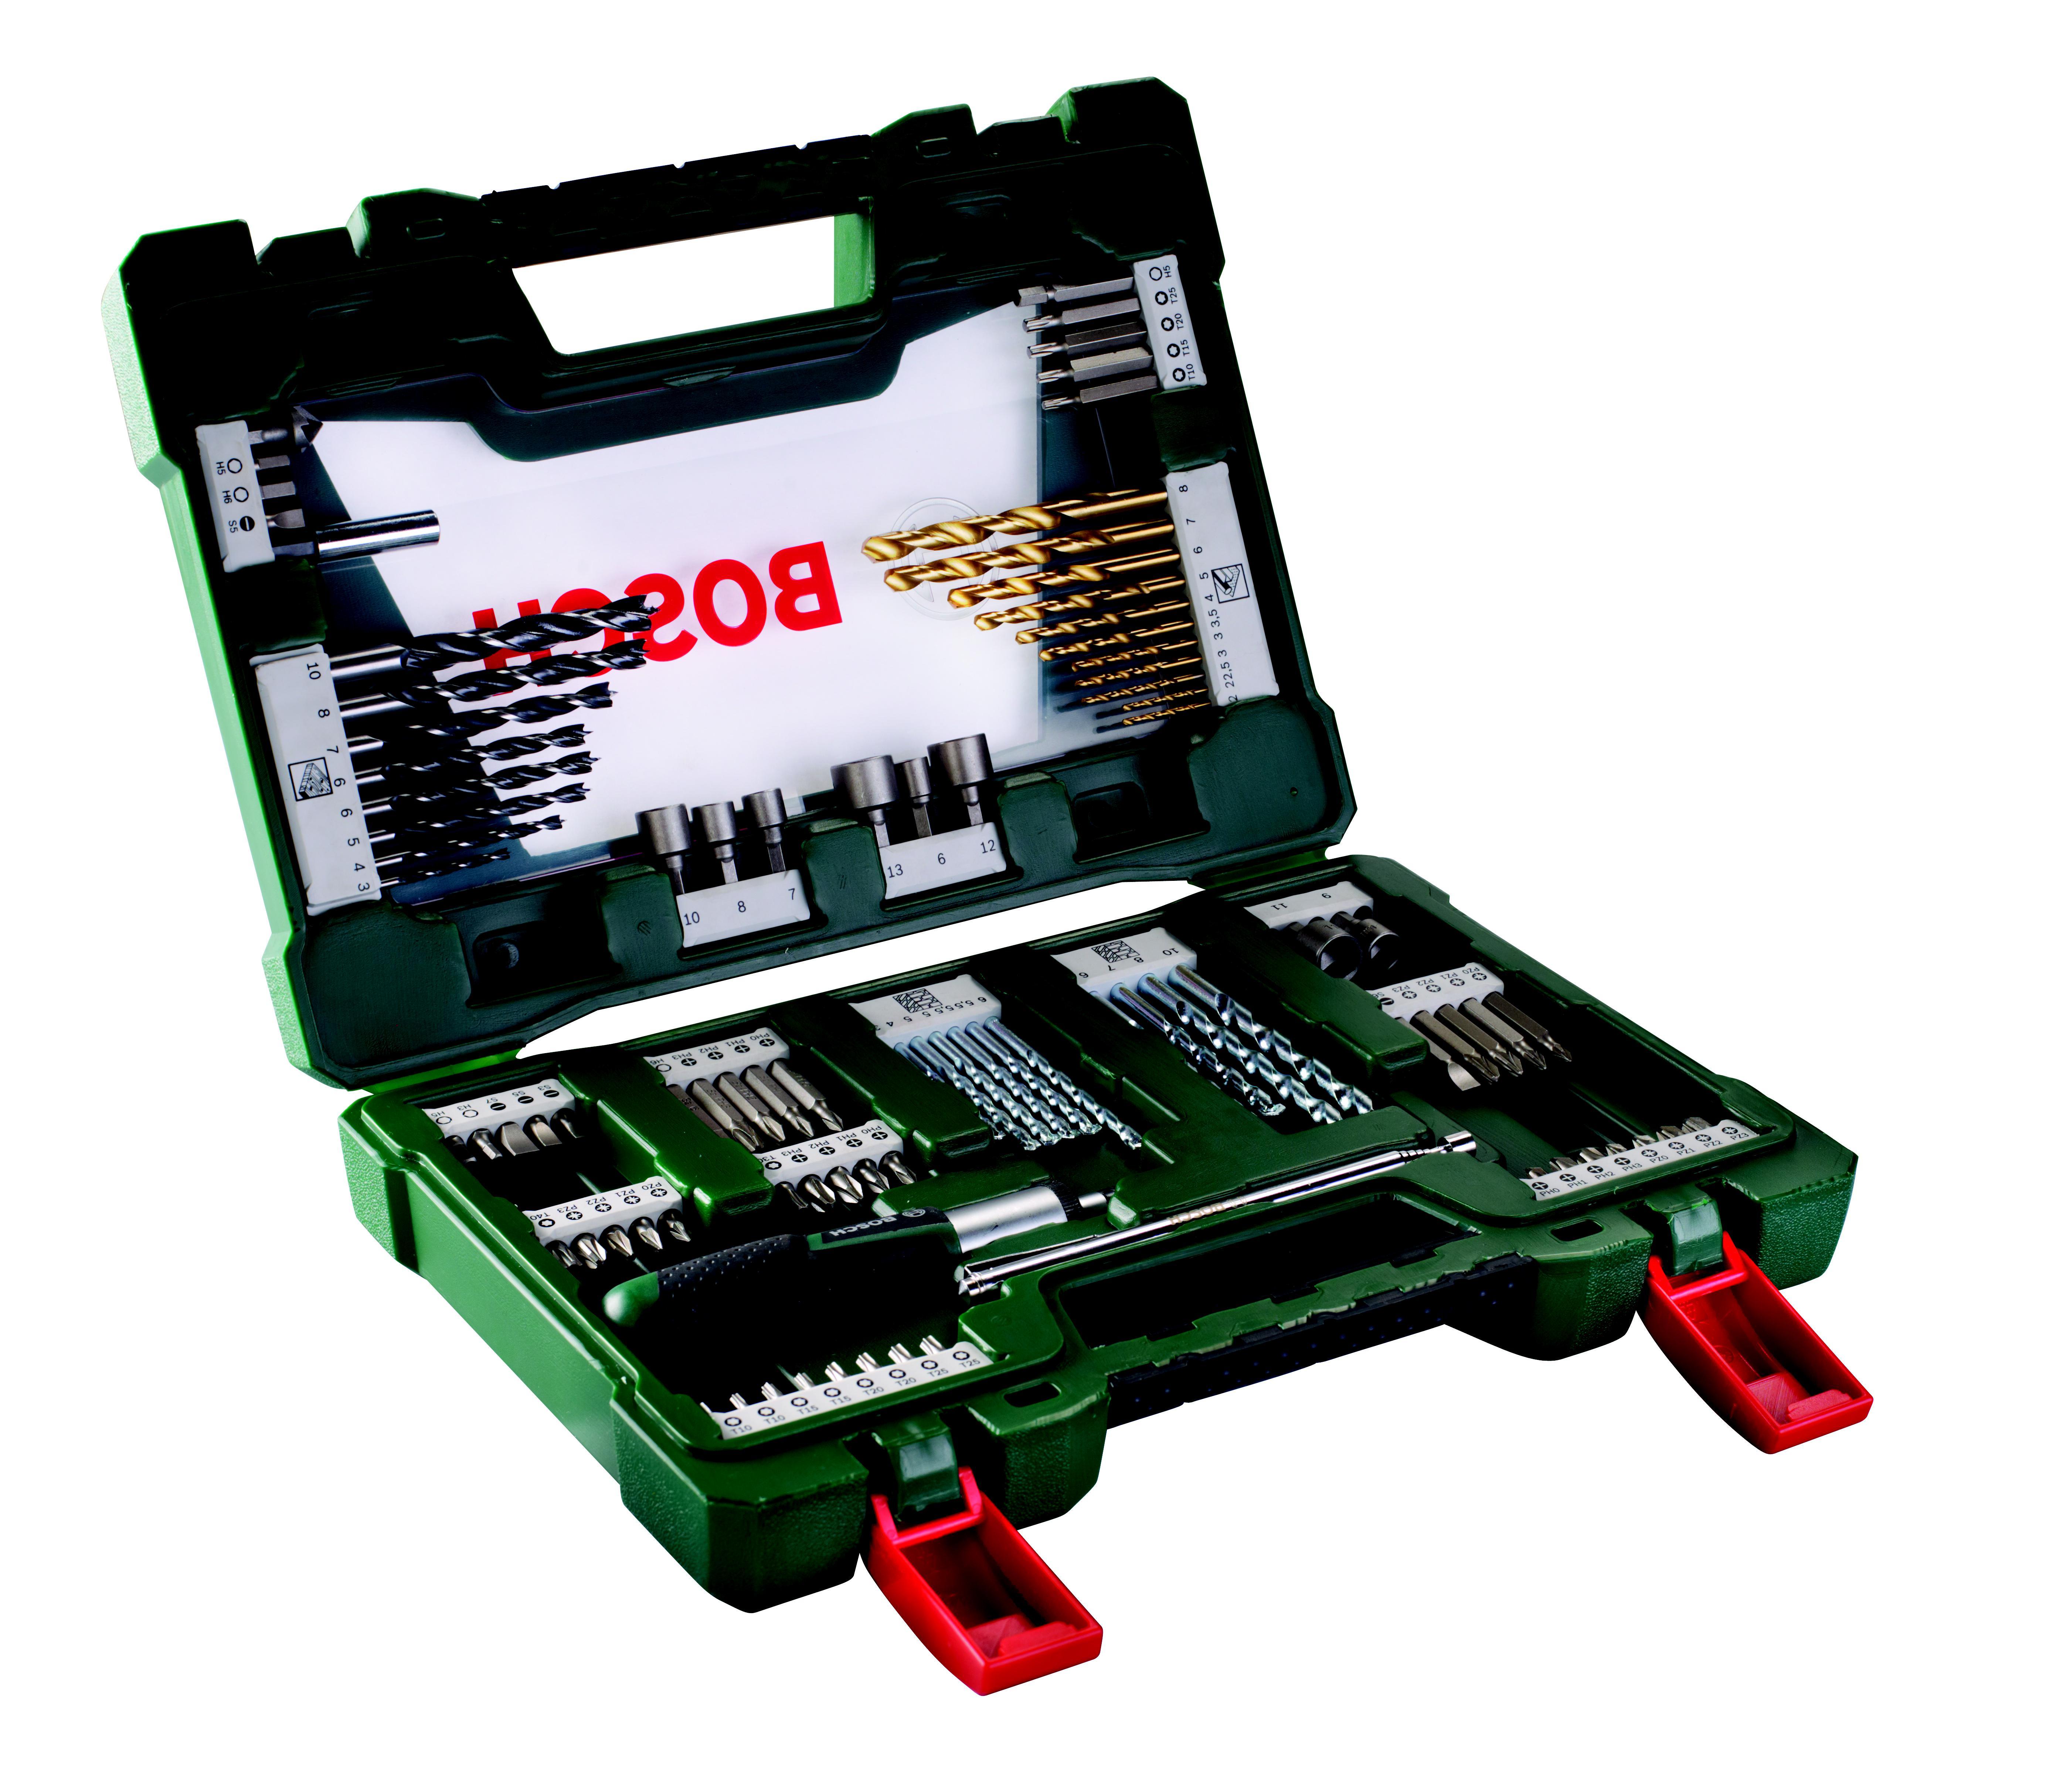 Набор бит и сверл Bosch V-line-91 91шт (2.607.017.195) набор сверл и бит bosch v line 68 2 607 017 191